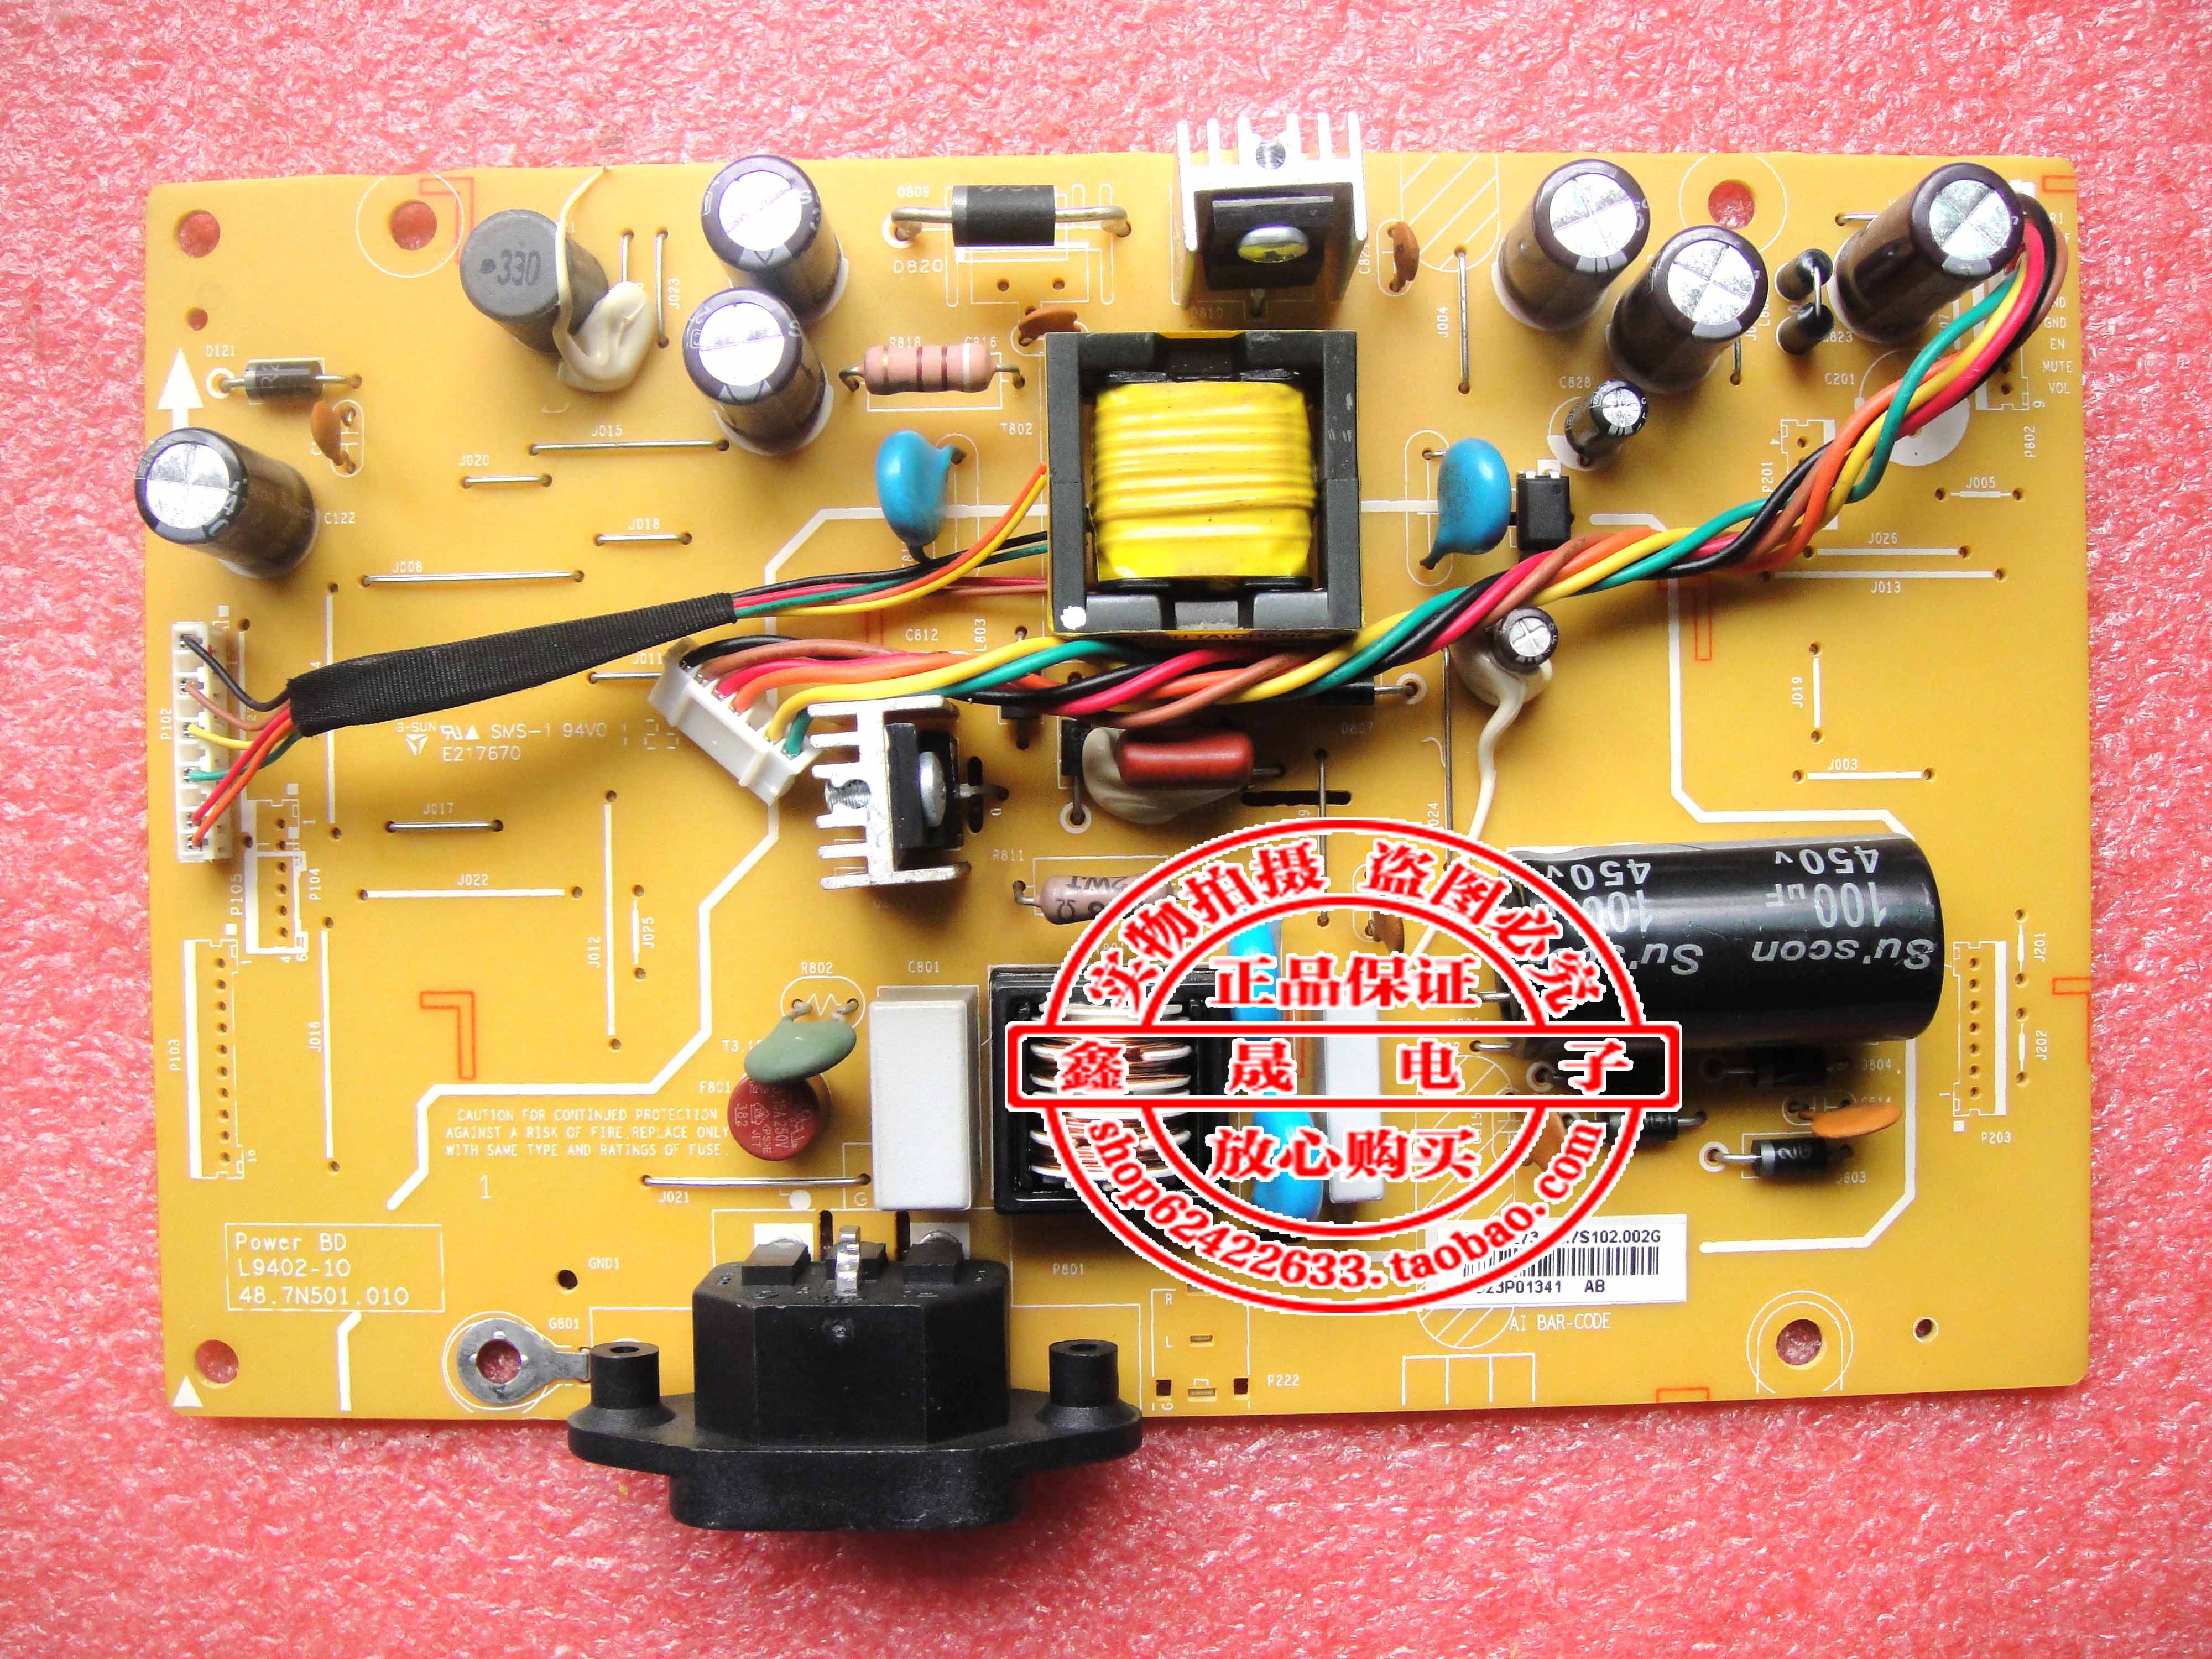 VA2410m-LED امدادات الطاقة مجلس 48.7N501. 010 L9402-10